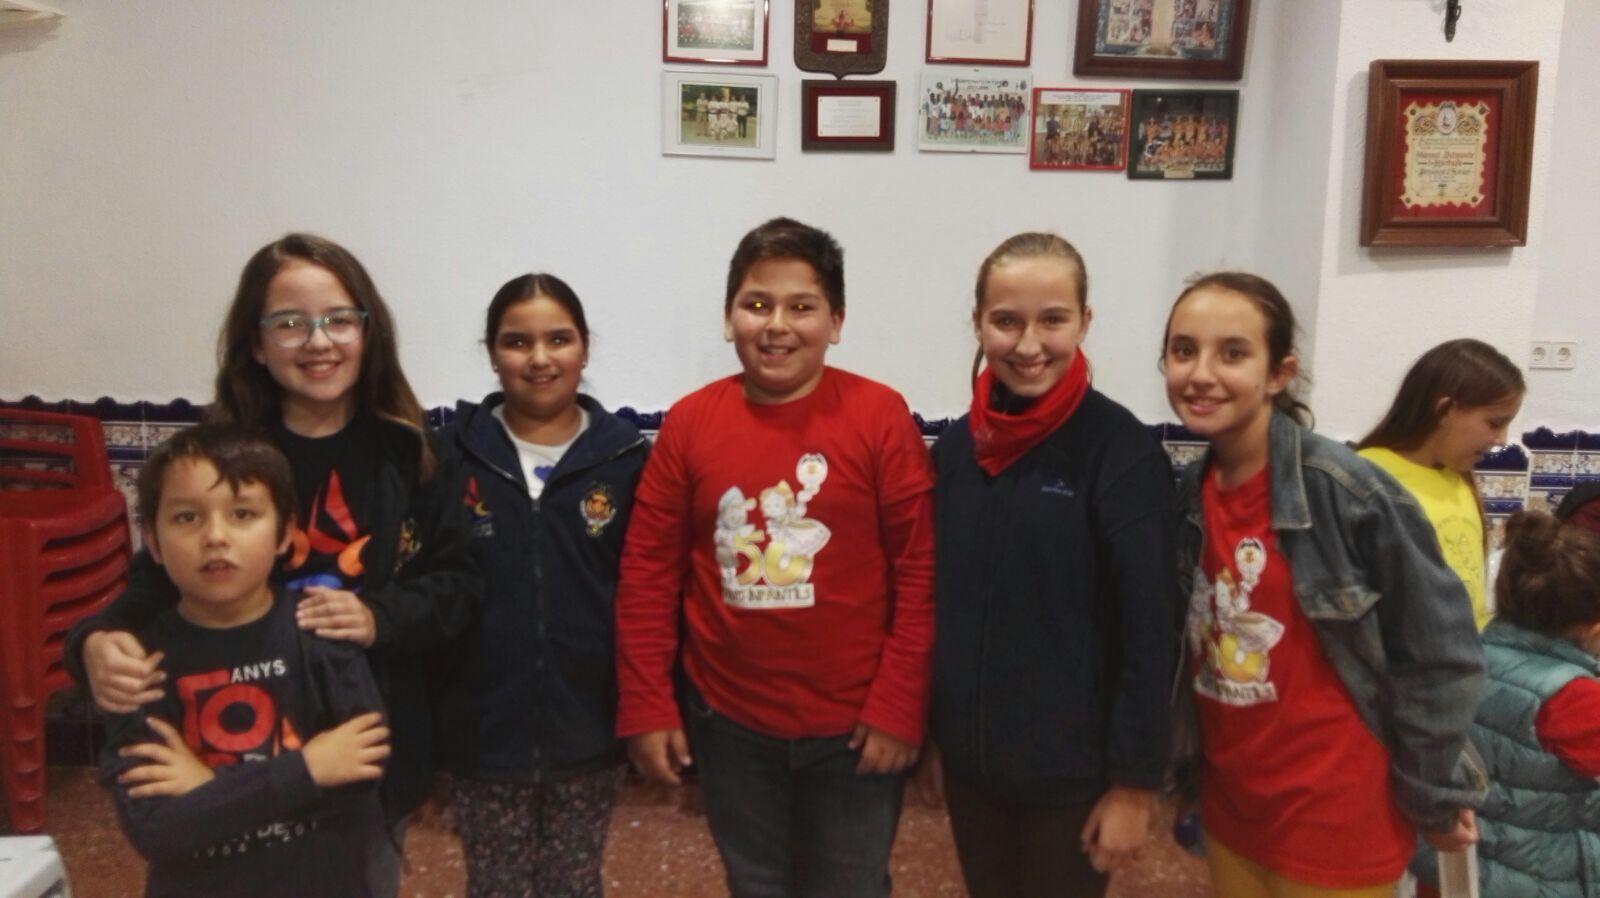 Comenzó el campeonato de parchís infantil de Camins al Grau